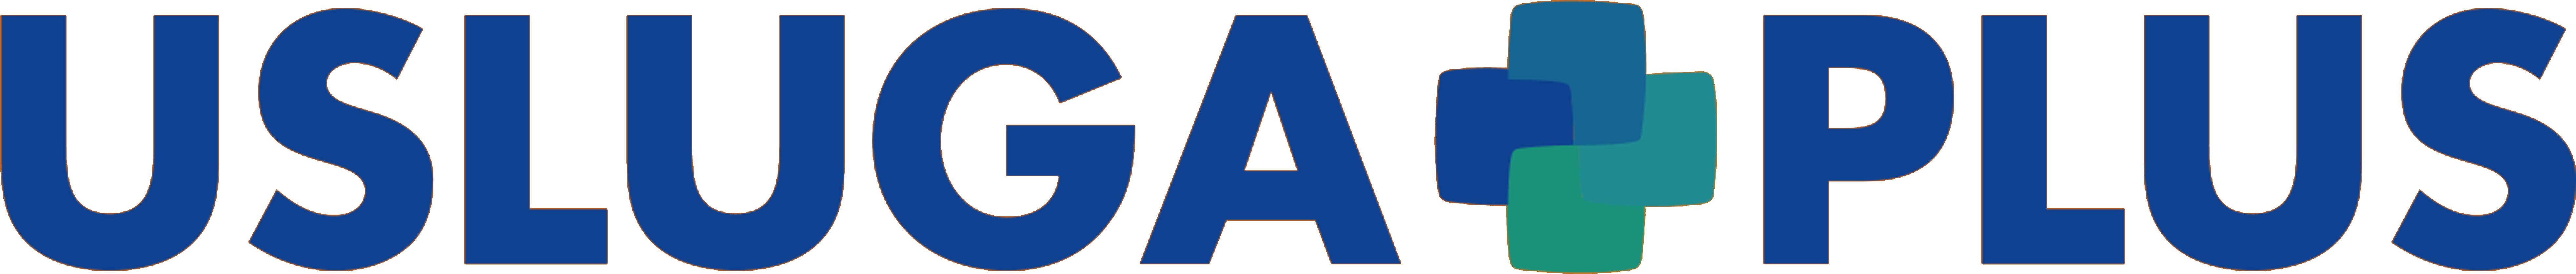 UslugaPlus logo